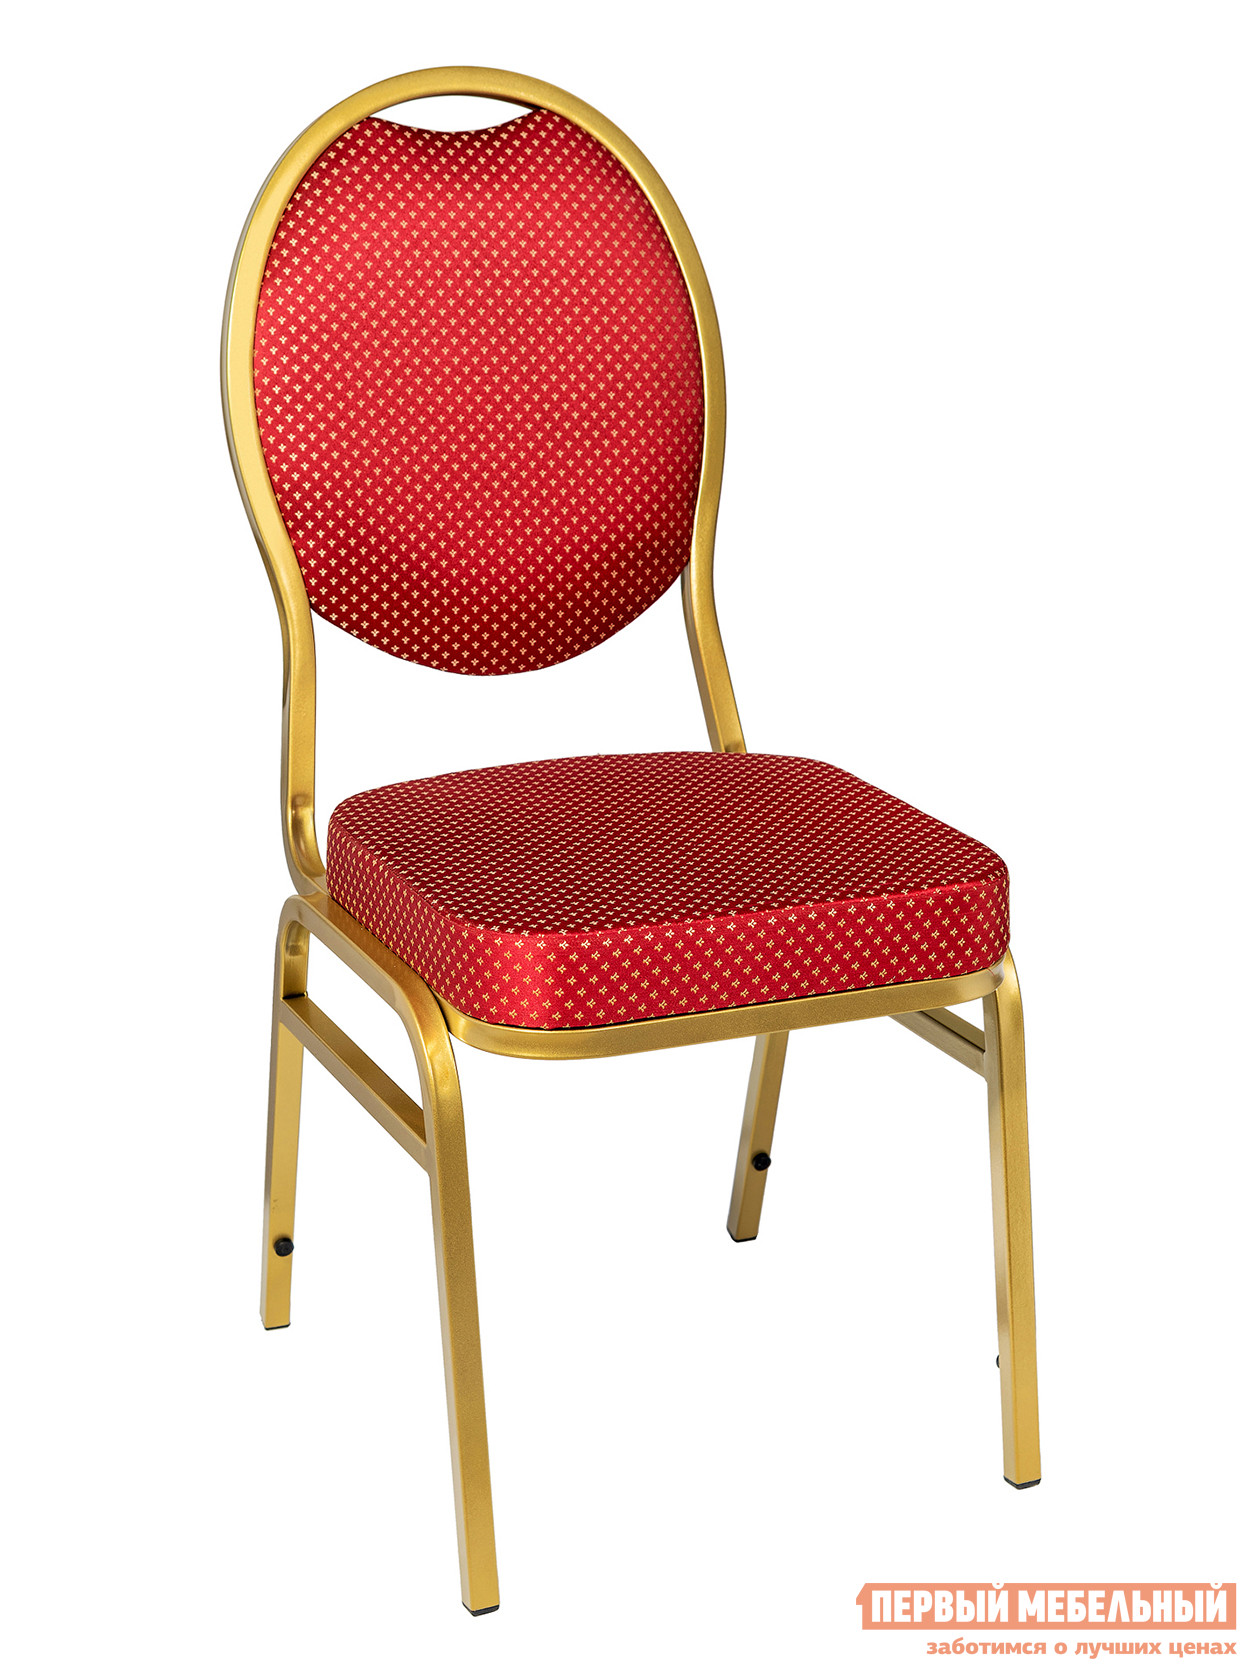 Кухонный стул STOOL GROUP Квин Каркас золото / Обивка красная (узор короны) от Купистол